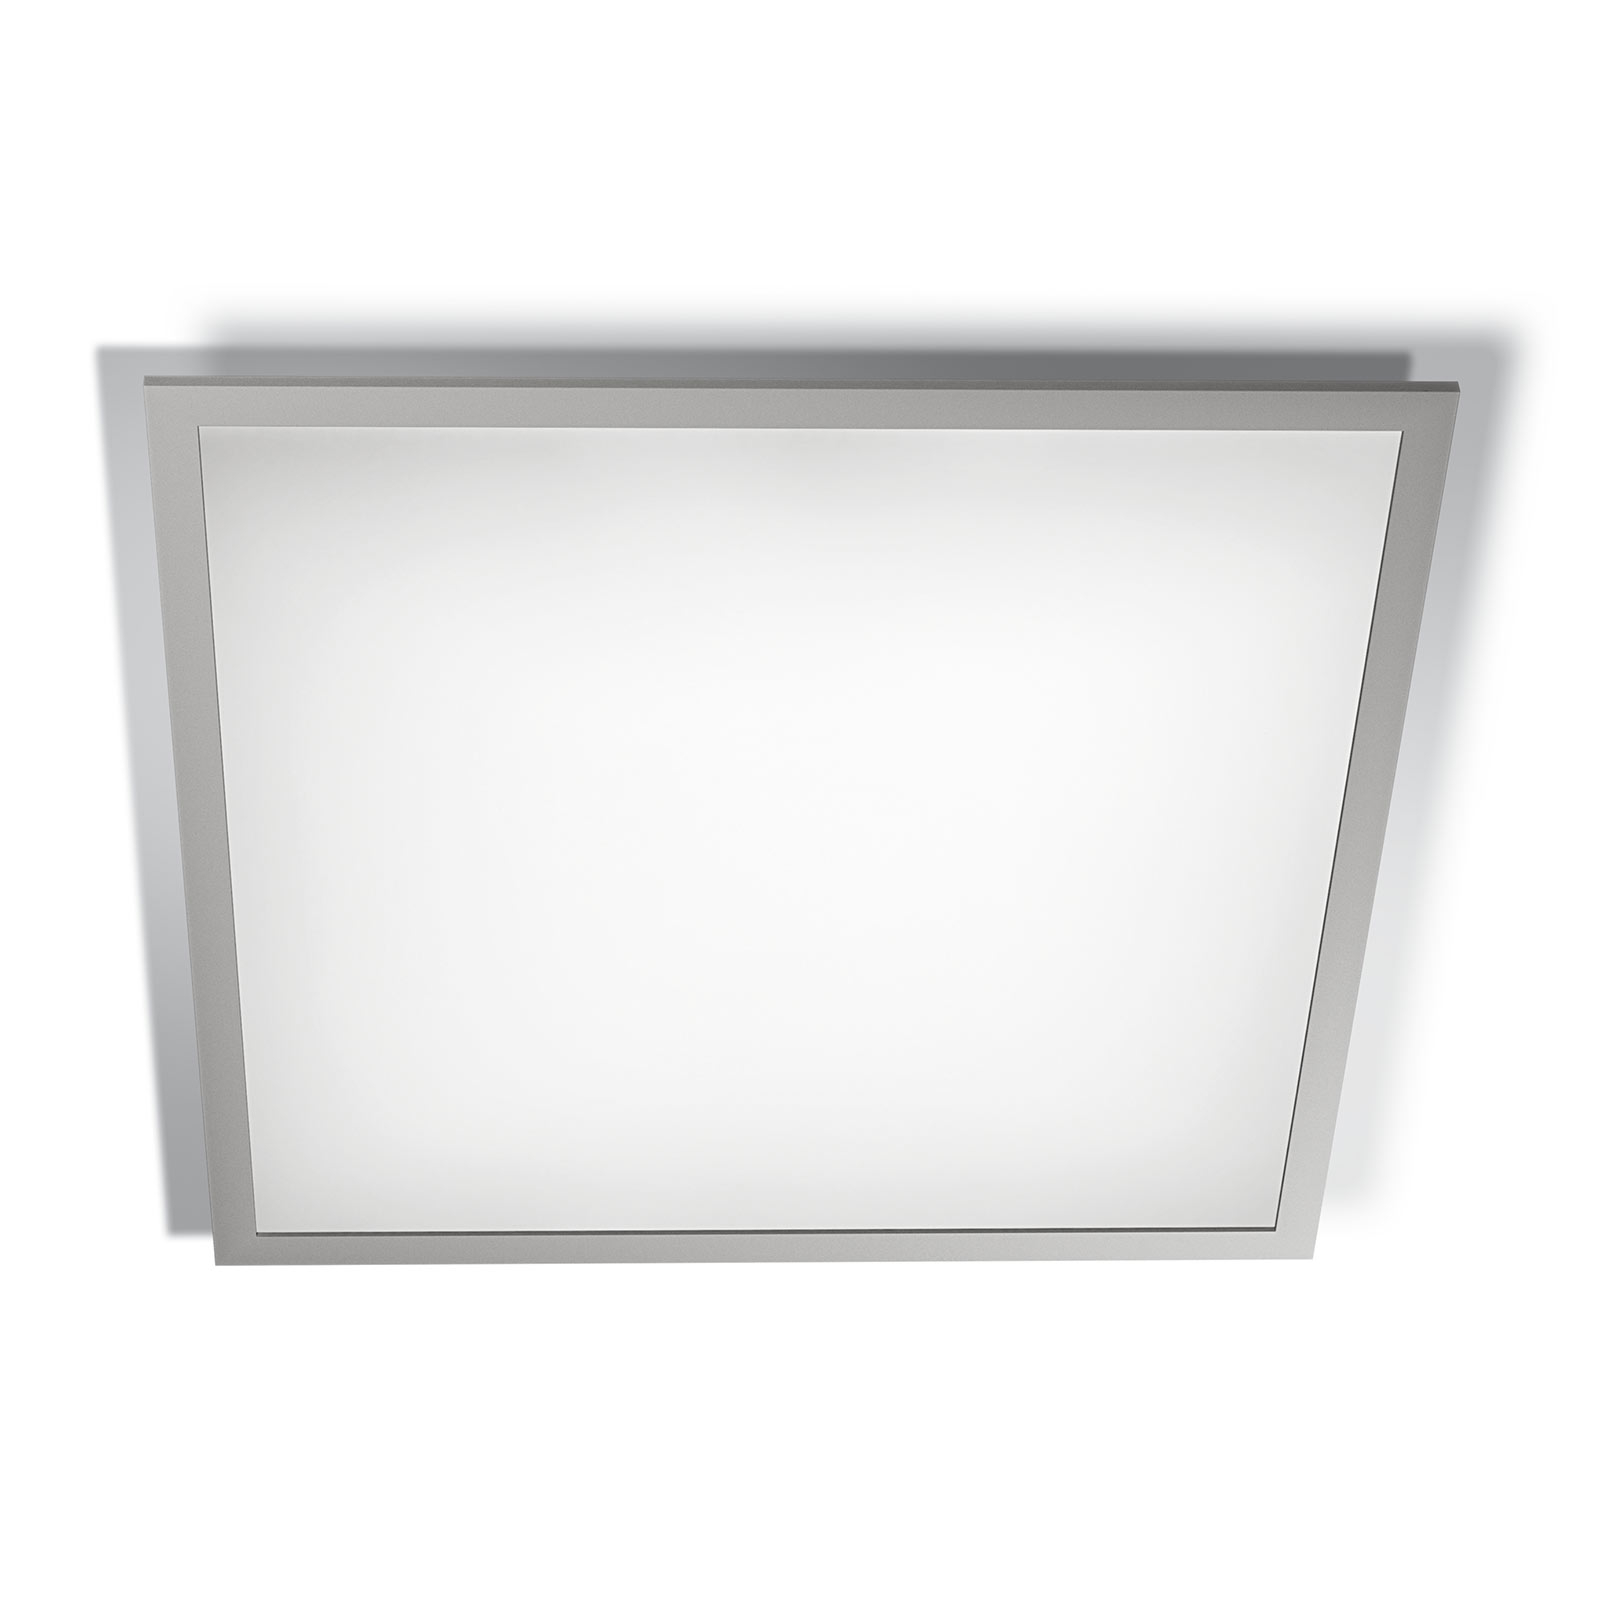 LEDVANCE Planon Plus LED-panel 60 cm 840 36W